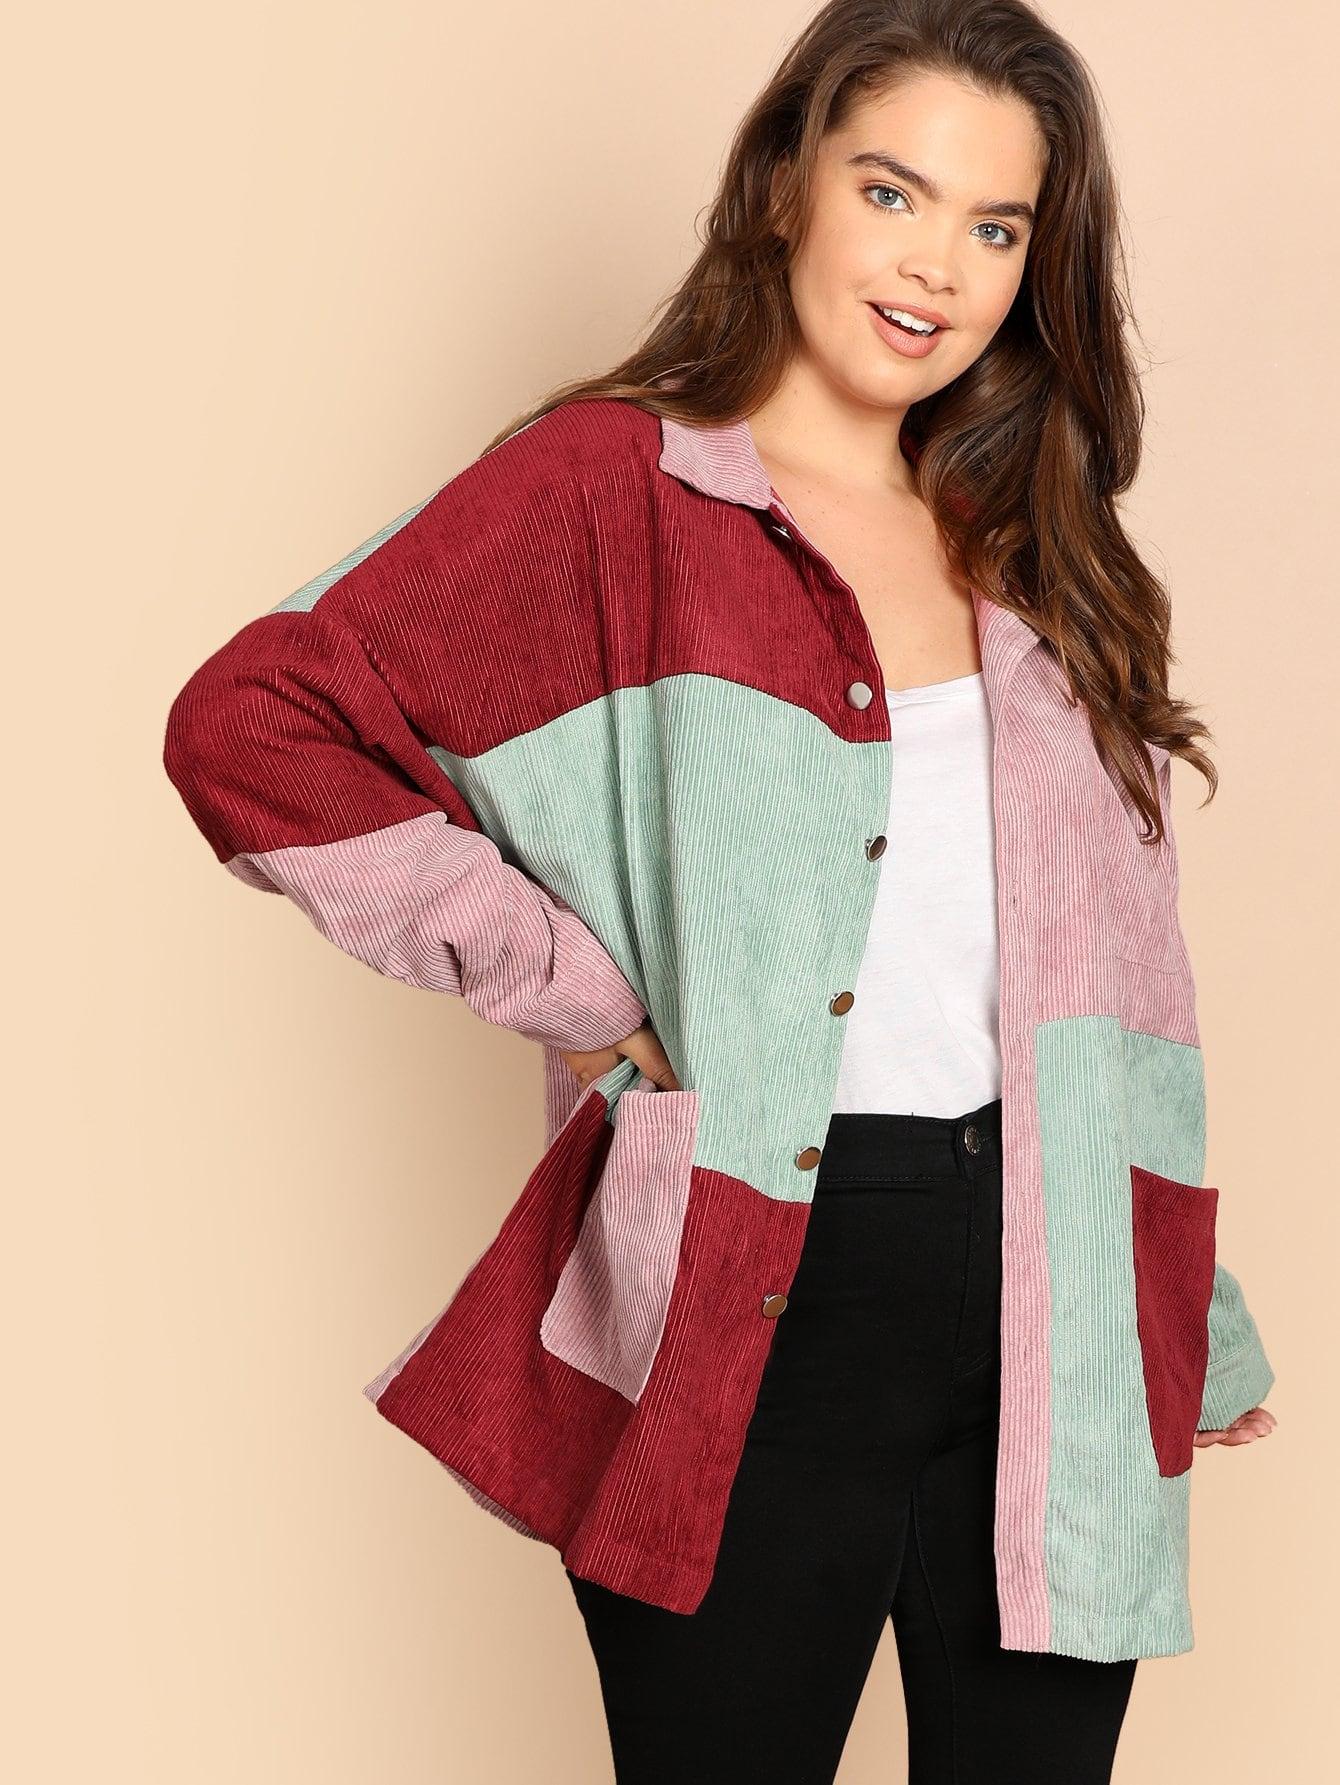 Купить Плюс размера контрастная вельветовая куртка с карманом, Faith Bowman, SheIn